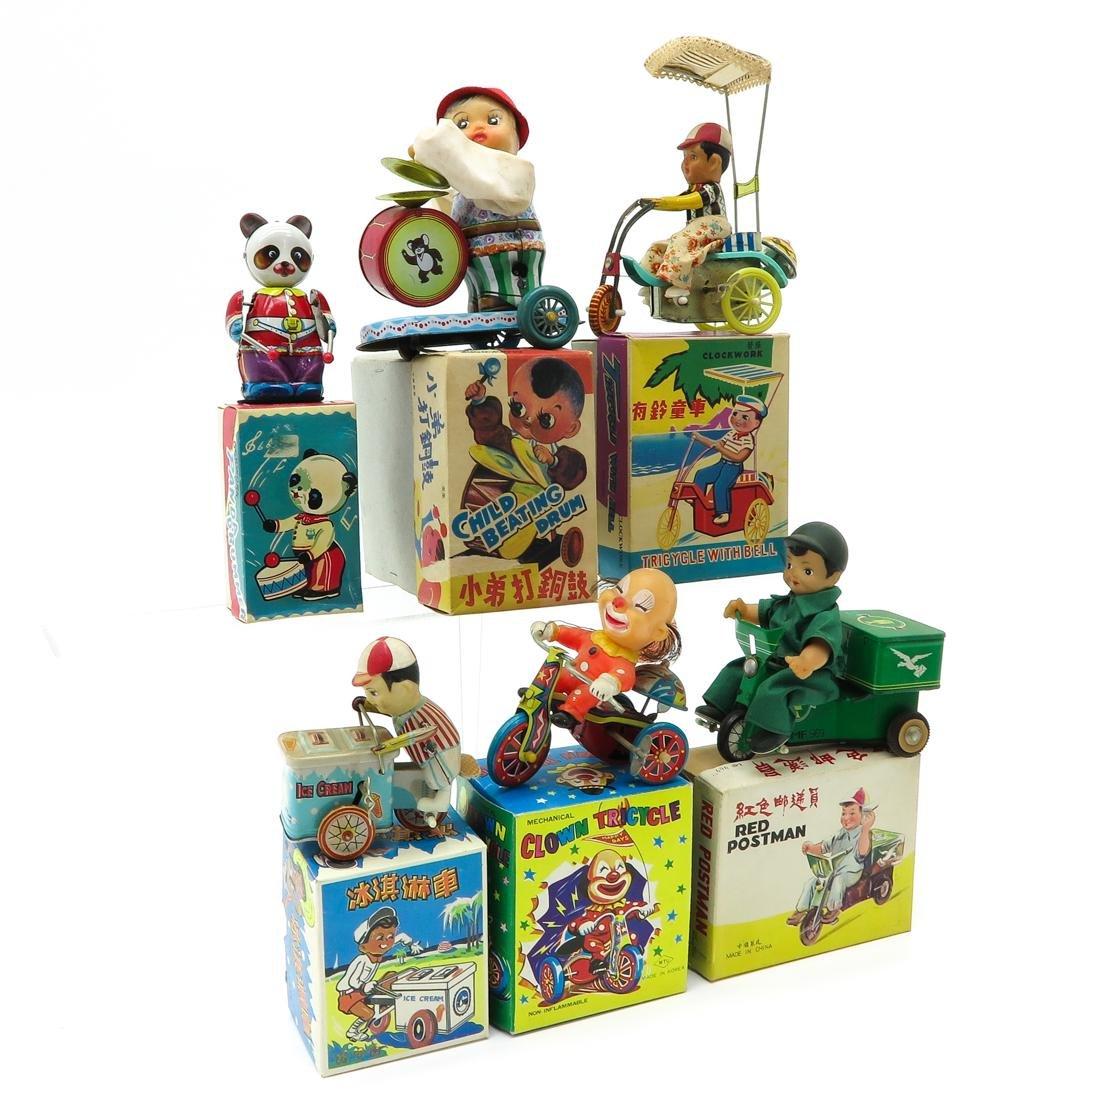 Diverse Lot of 6 Vintage Toys - 2